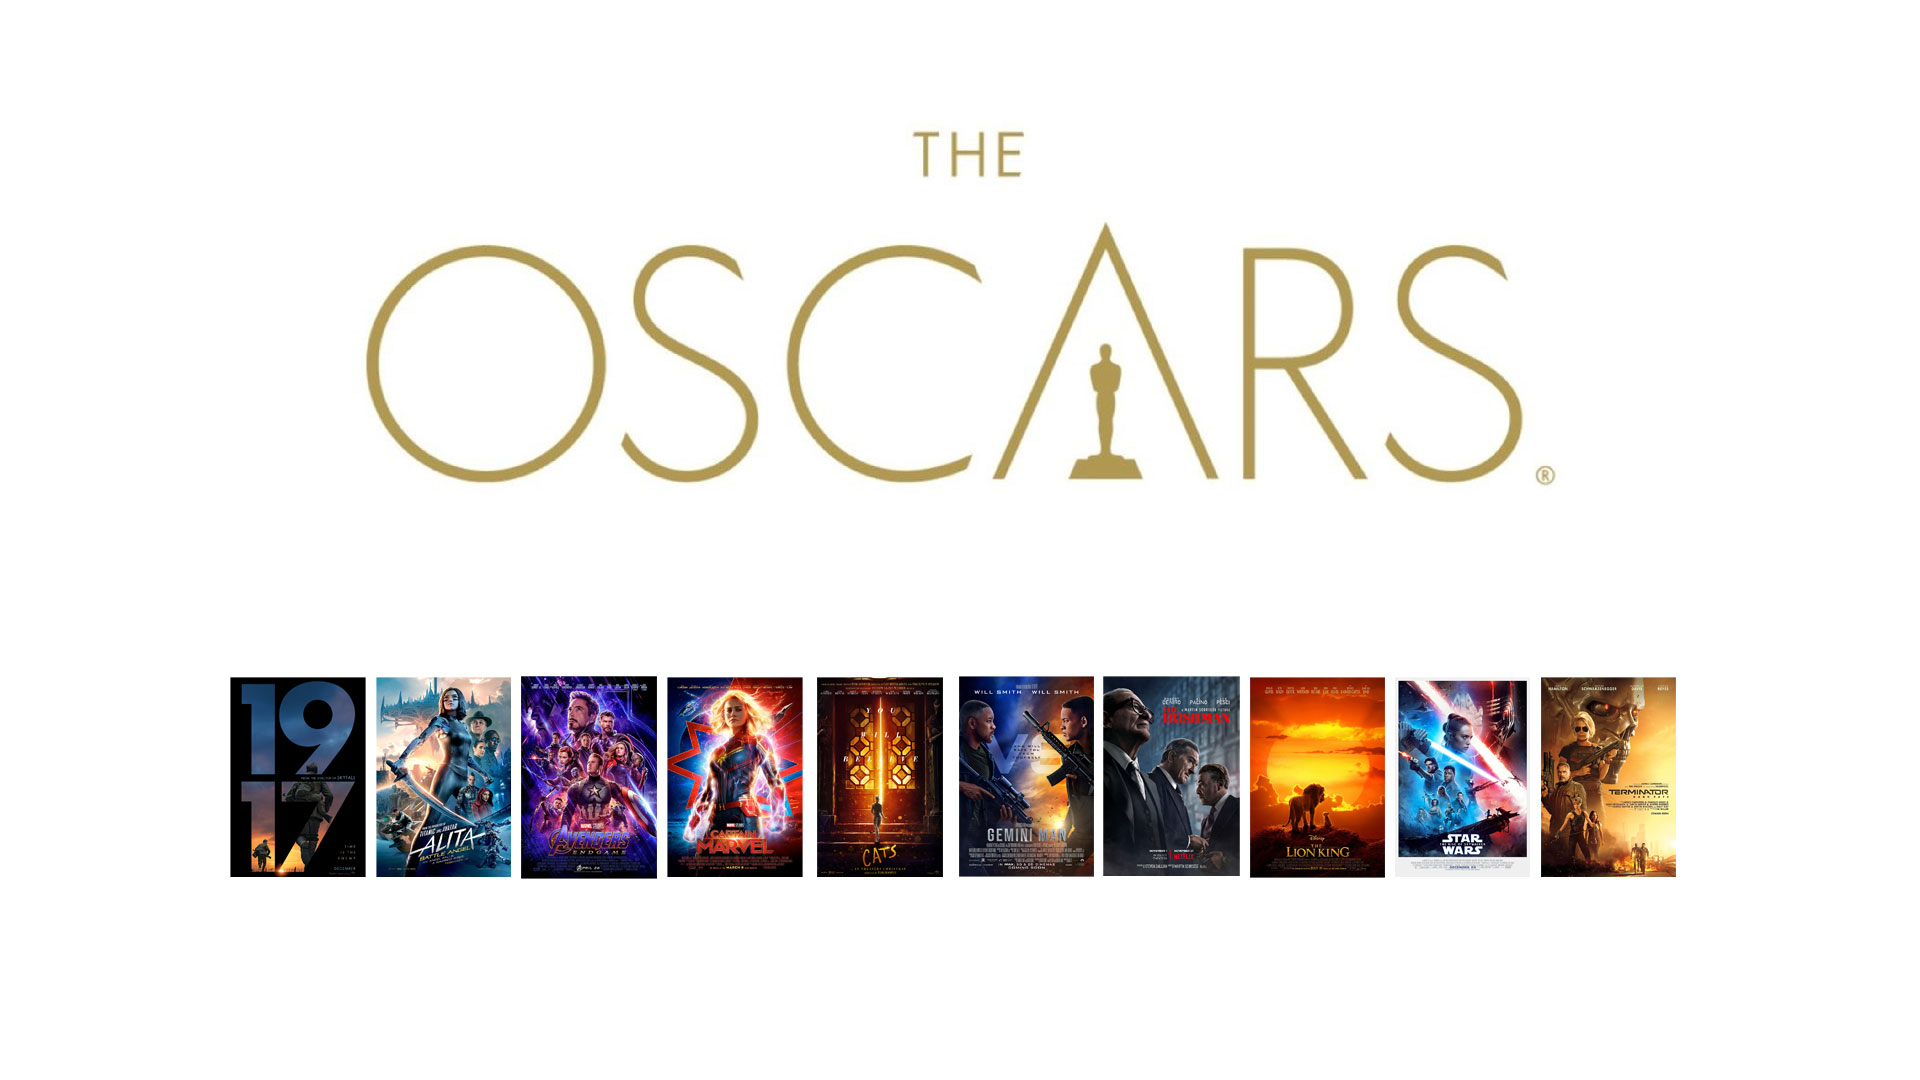 OSCARS 2020 THE VFX Shortlist   The Art of VFXThe Art of VFX 1920x1080